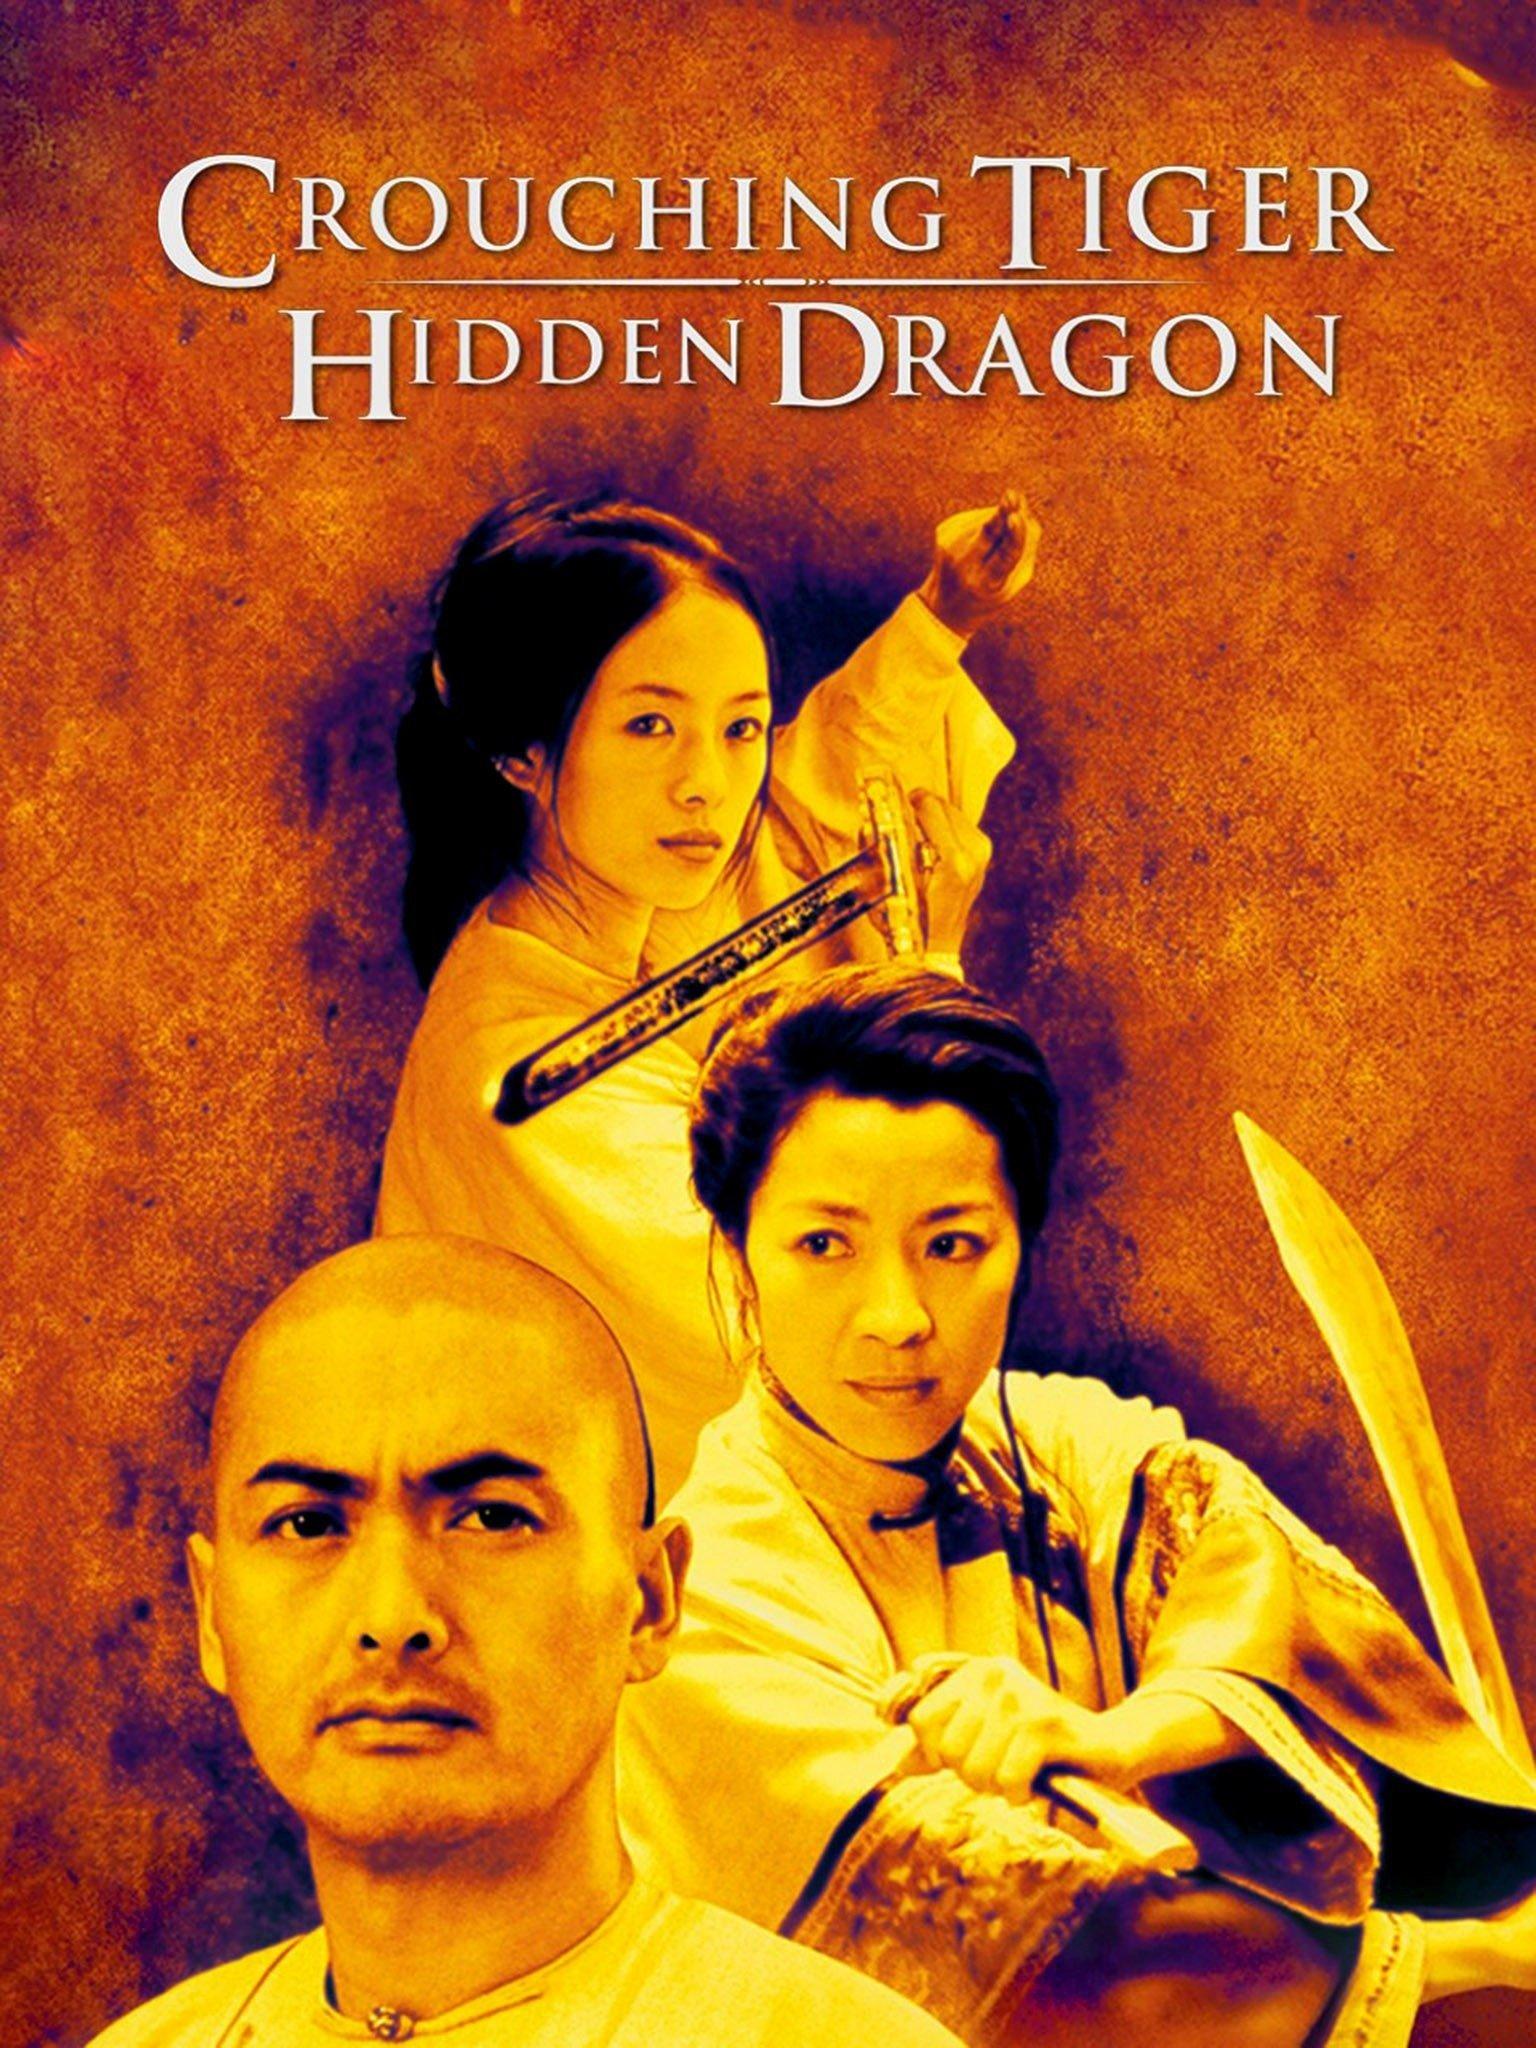 crouching-tiger-hidden-dragon-movie-poster.jpg